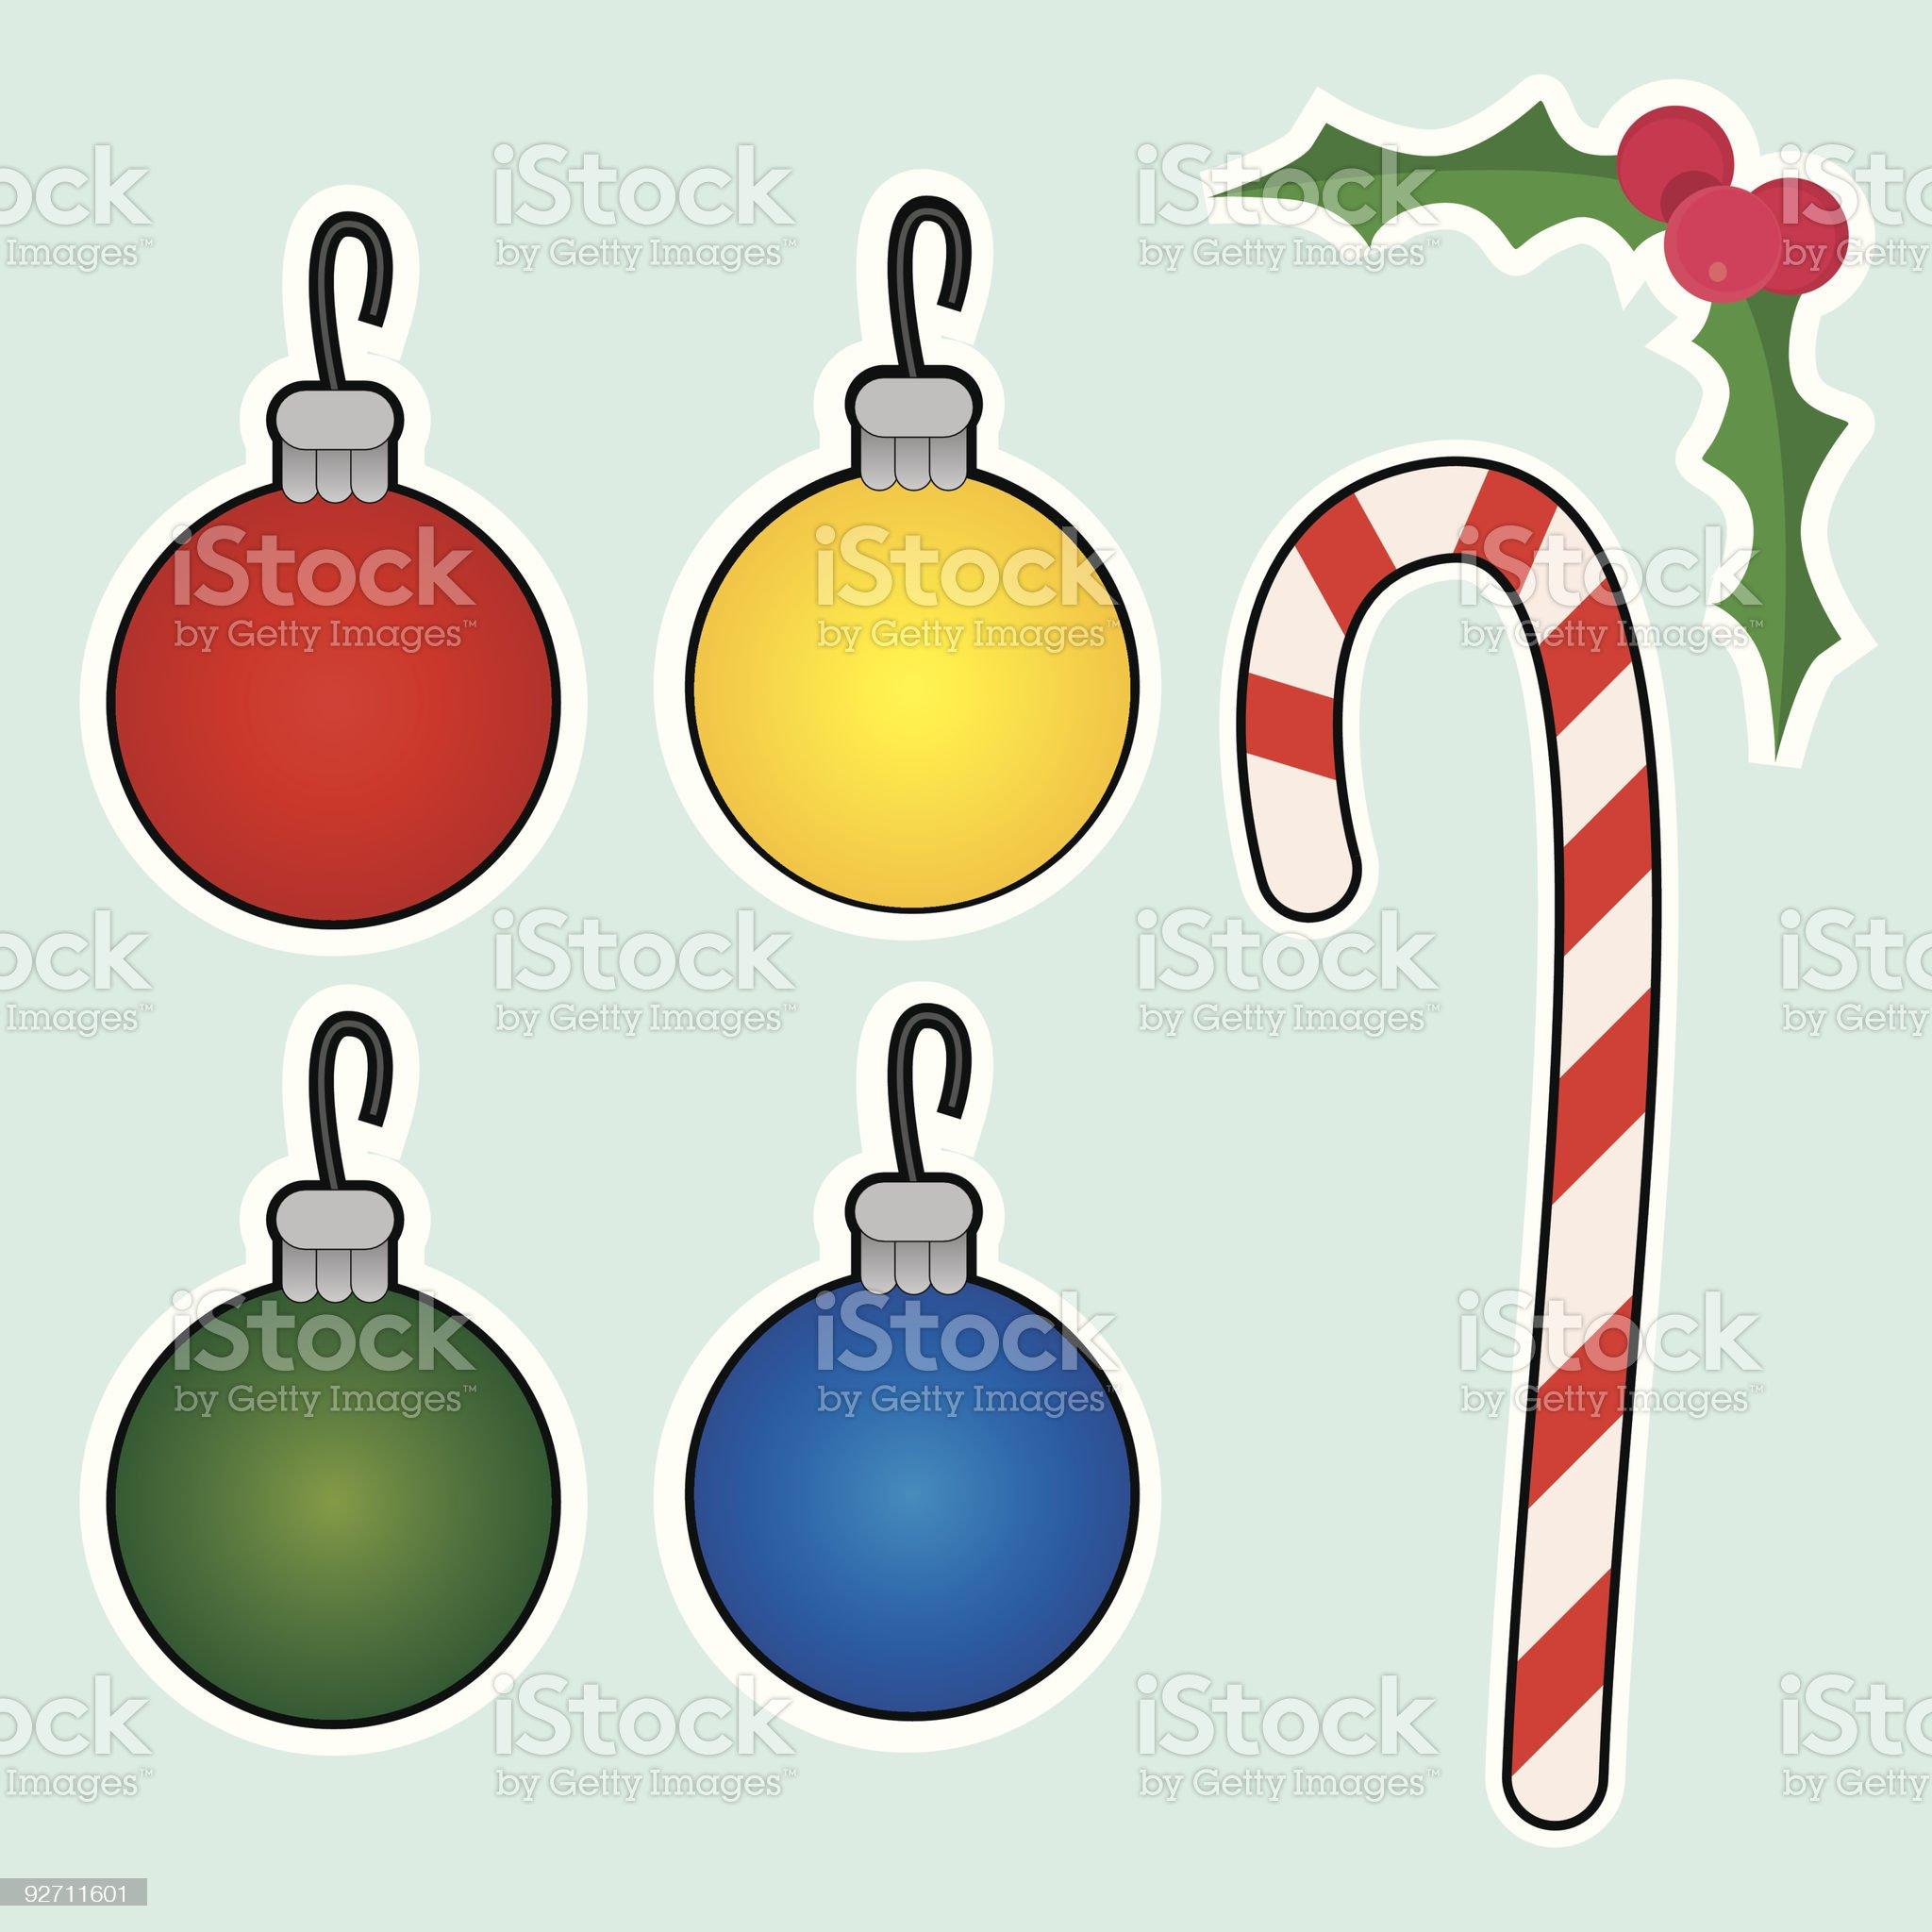 Christmas art royalty-free stock vector art